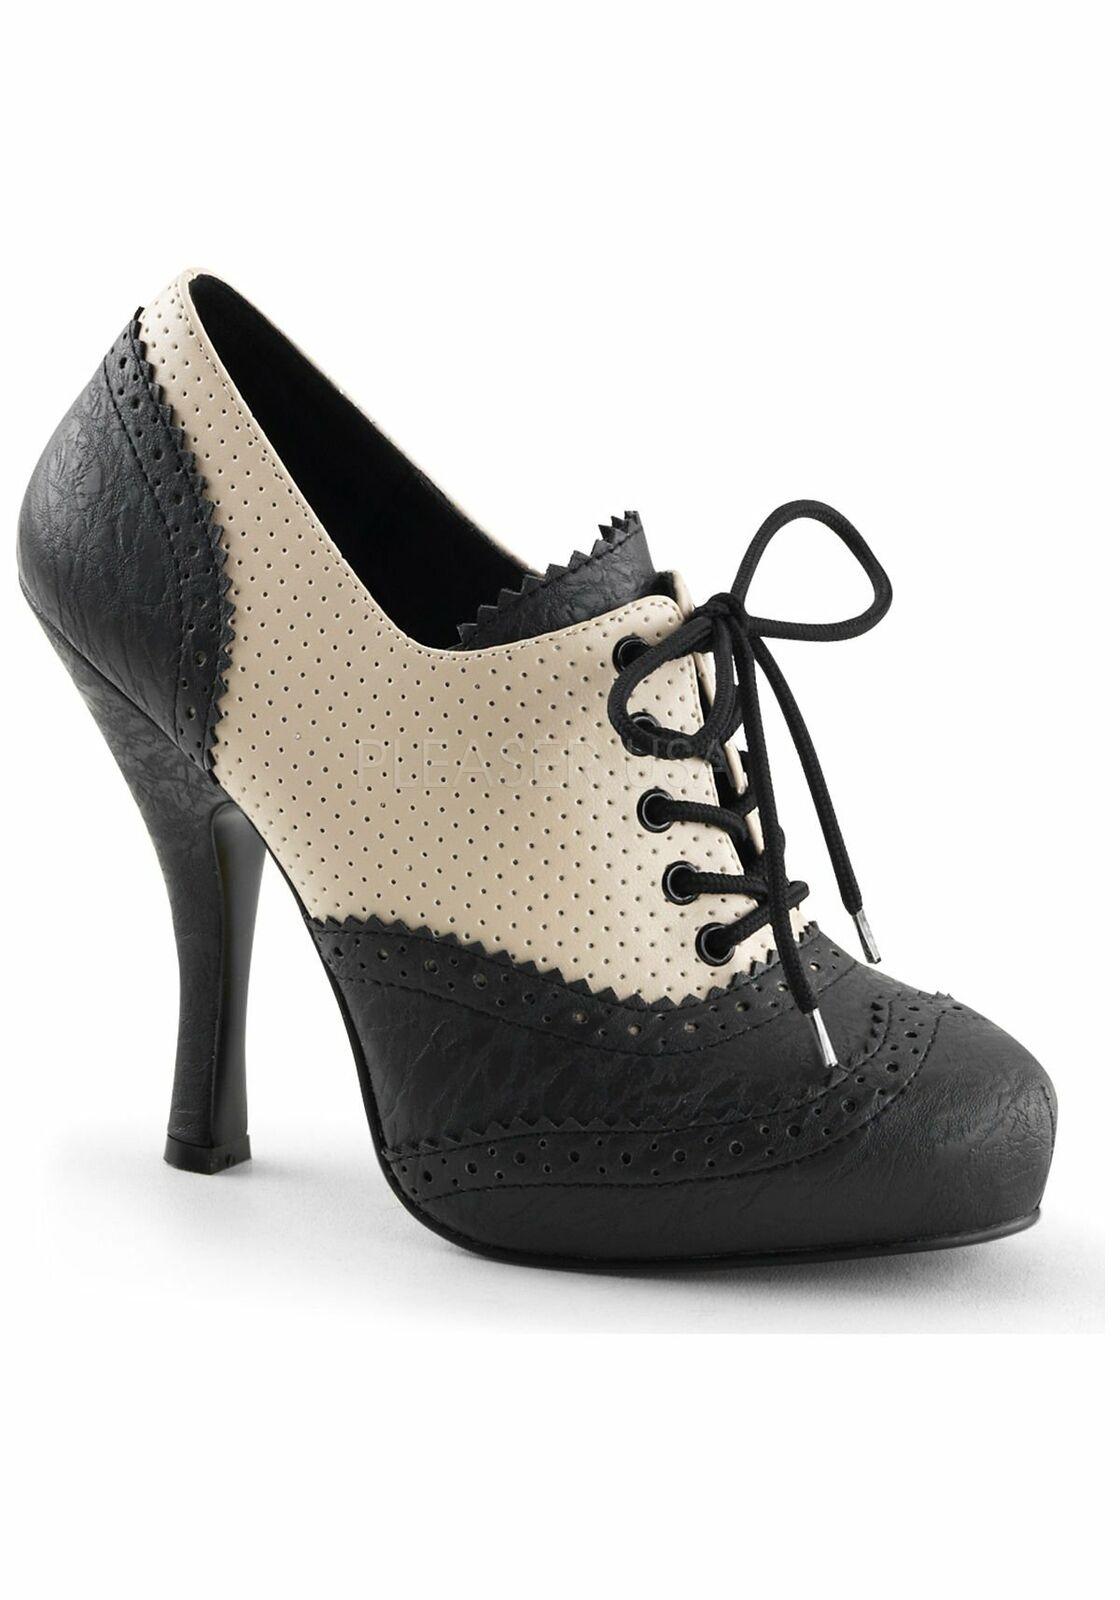 Pin Up Couture 4 1 2'' Heel, 3 4'' 4'' 4'' Hidden Platform Lace-Up Spectator Oxford 53a8d6